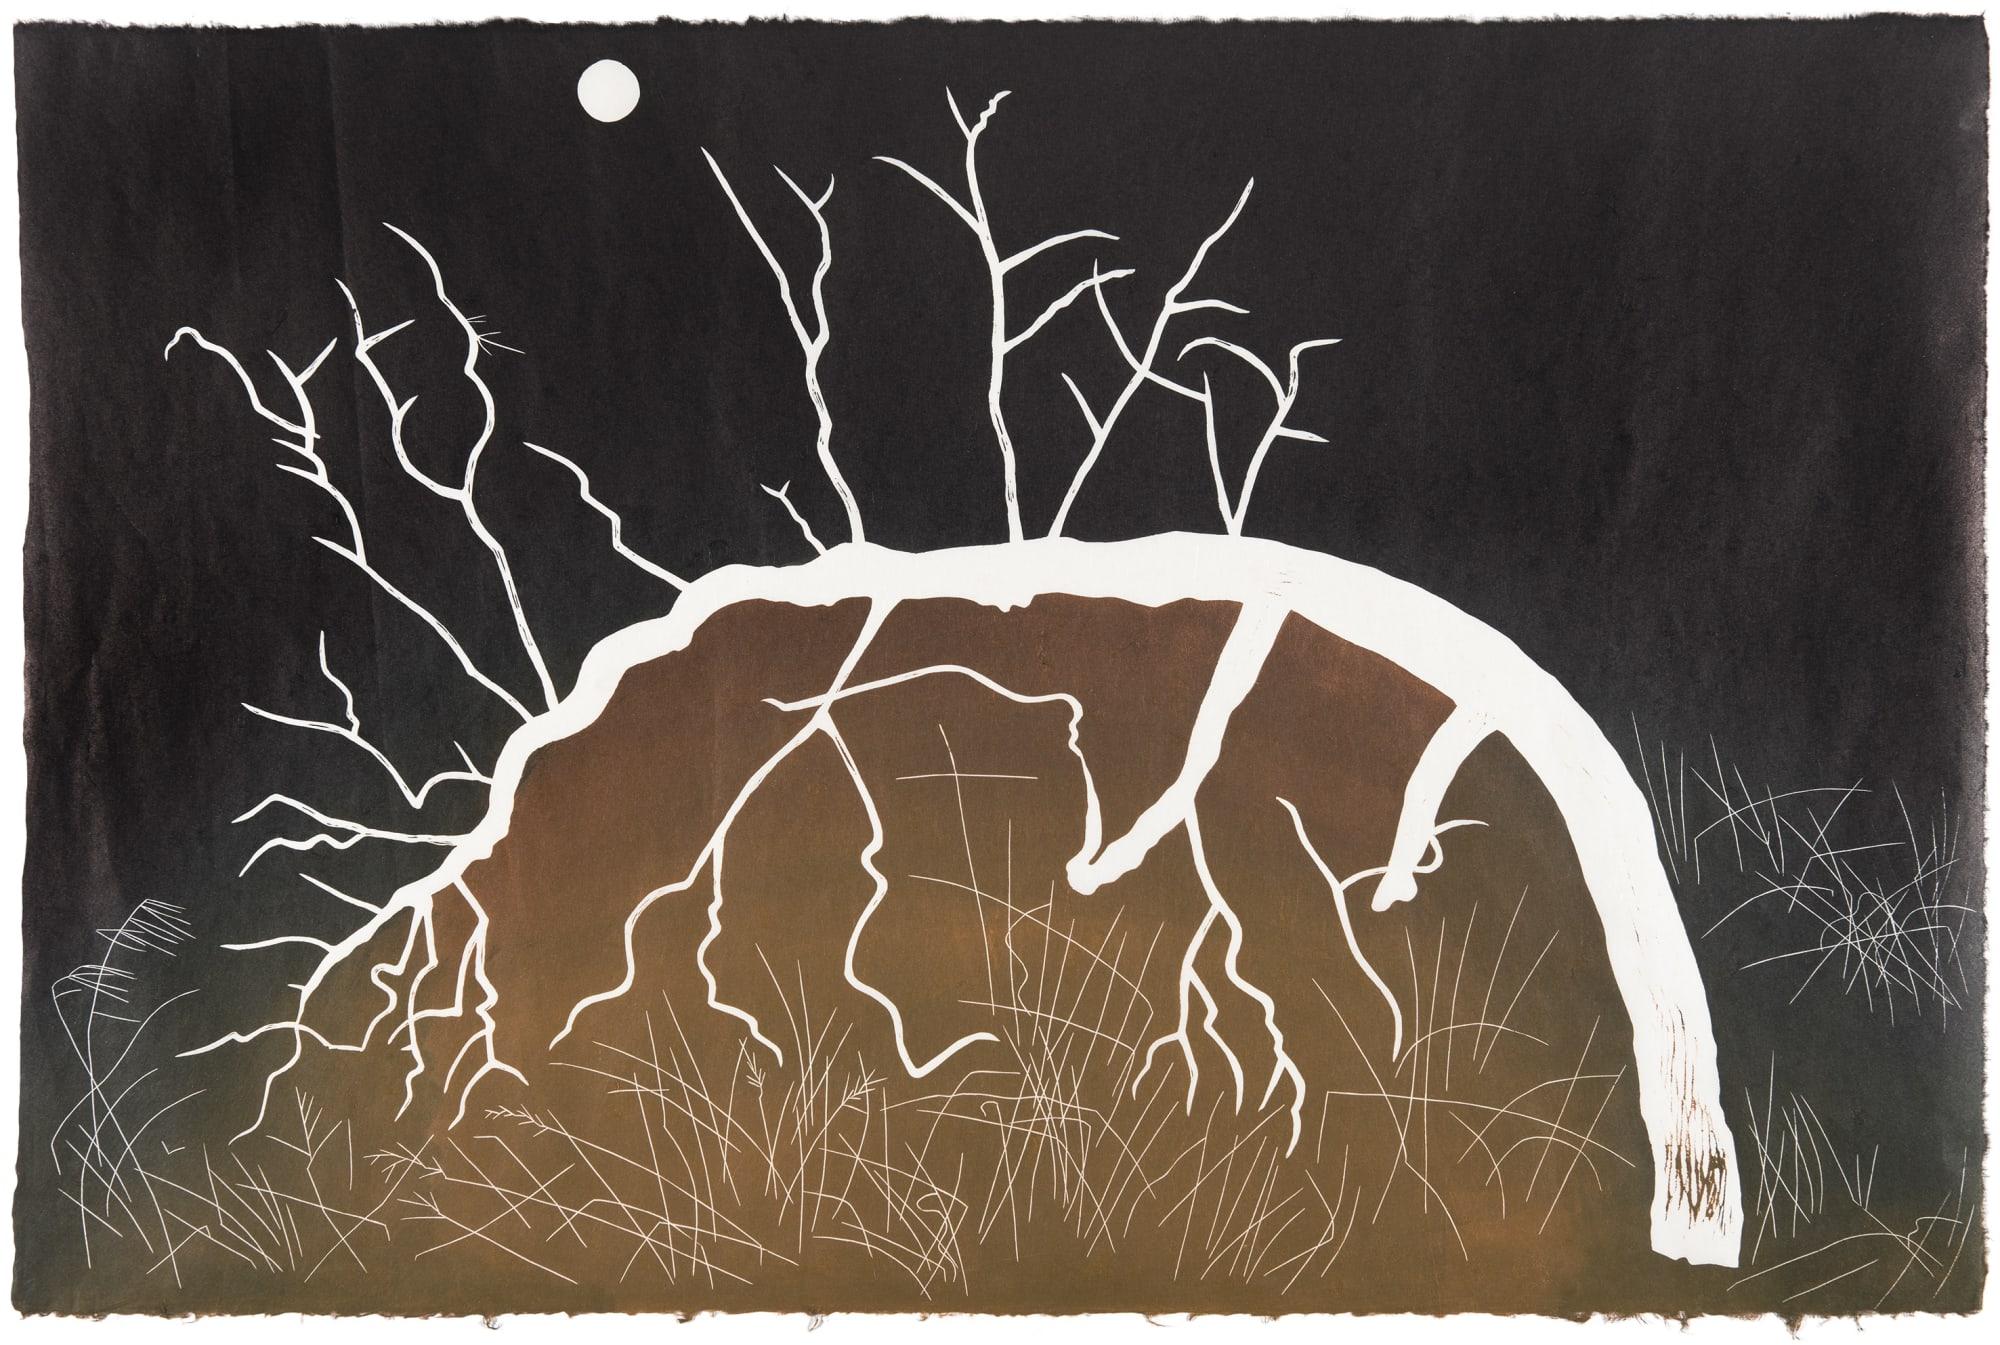 Burnt Bent Glyph, 2020, an artwork by Australian contemporary printmaker GW Bot, represented by Rebecca Hossack Art Gallery